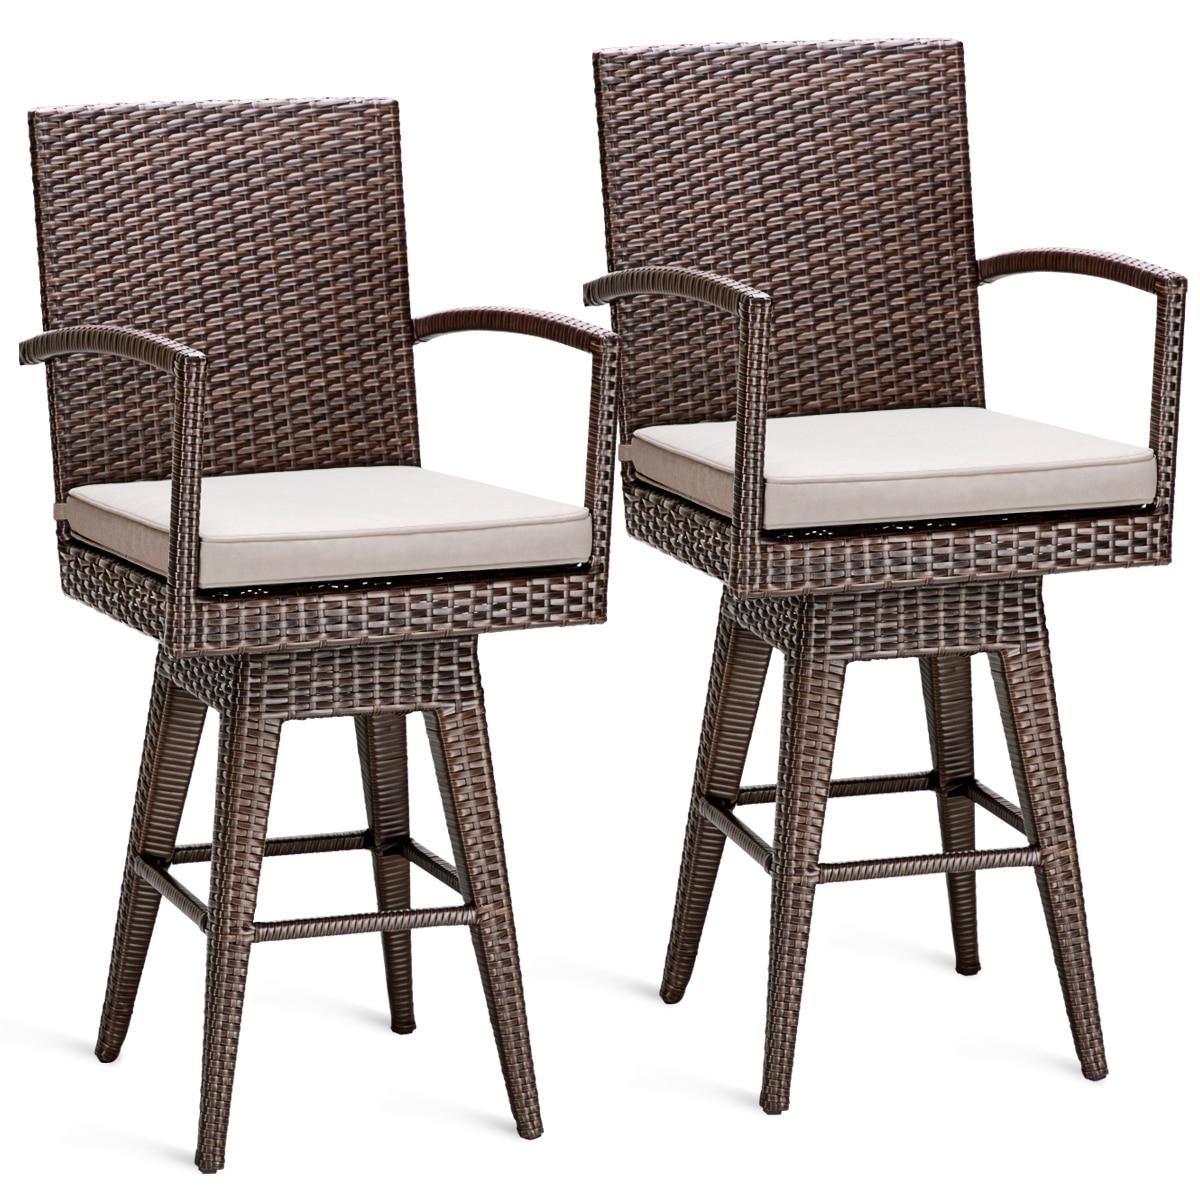 Costway 2PCS Rattan Swivel Bar Stool Chair Patio Backyard Furniture Seat Cushion